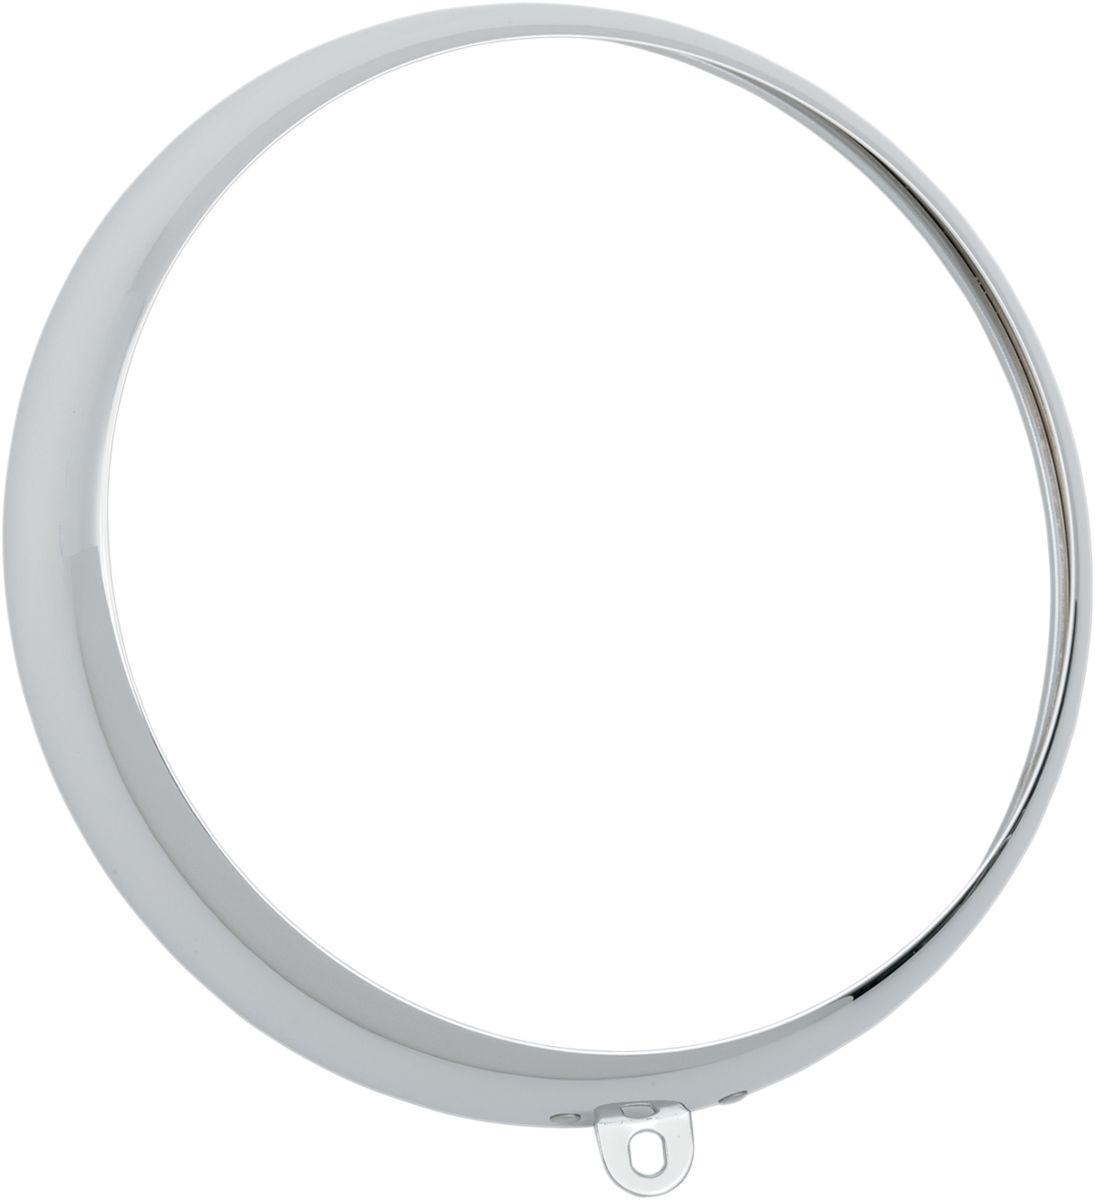 【Drag Specialties】頭燈/燈眉 鍍鉻 F/2001-0556 【RING TRIM CHR F/2001-0556 [2001-0557]】 - 「Webike-摩托百貨」